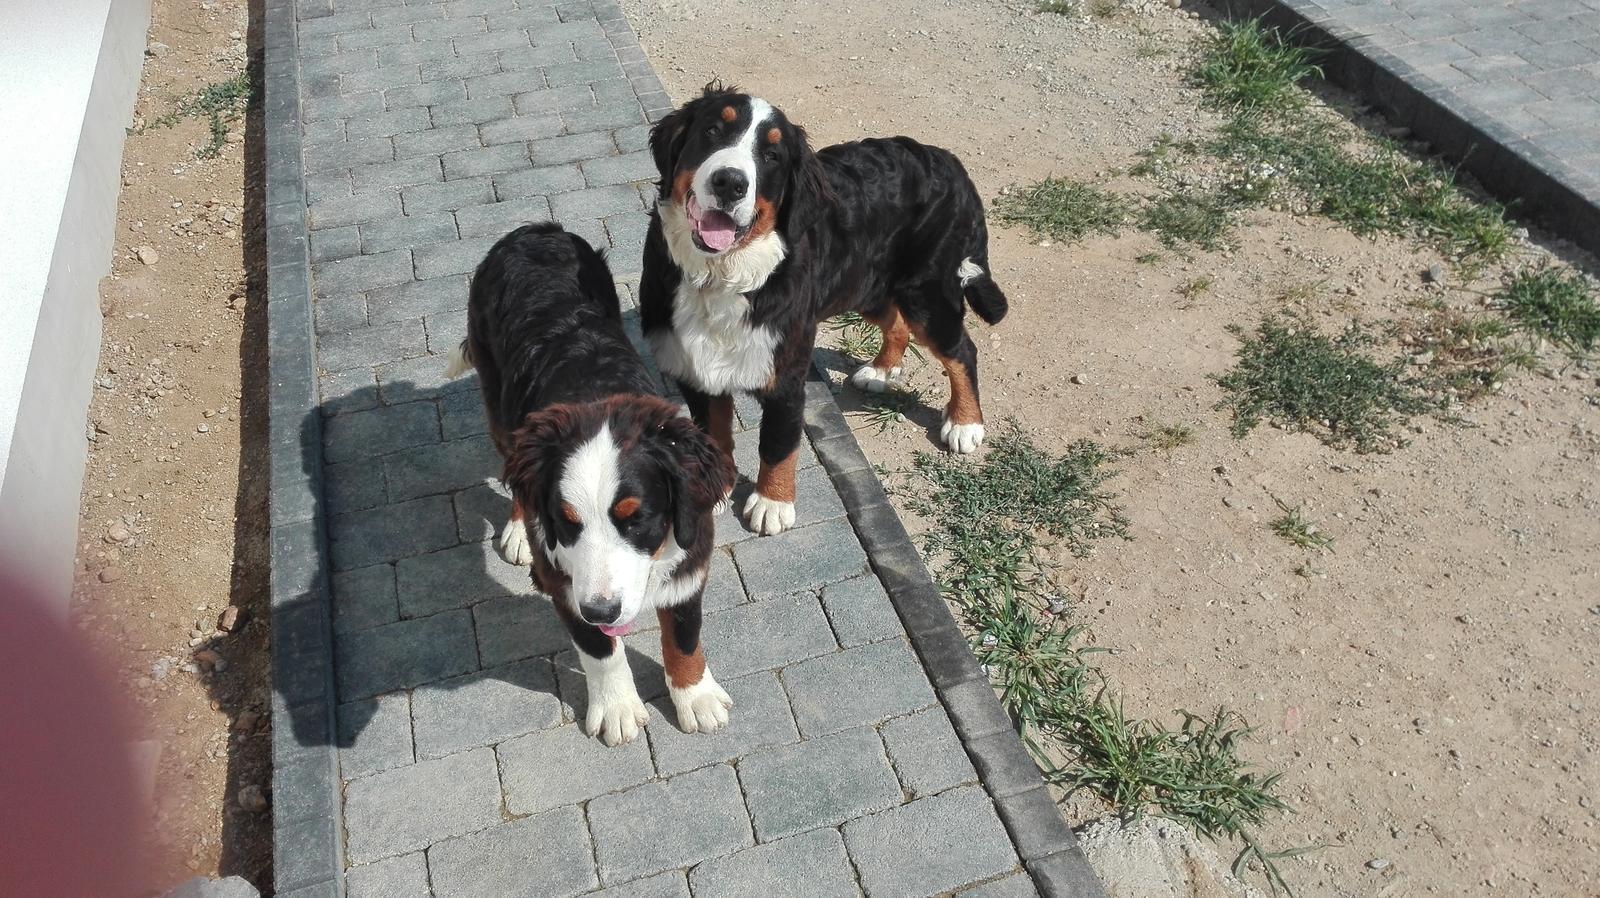 Nas zverinec - dve fenky,jeden pes a dvaja kocurikovia - nase zlaticka